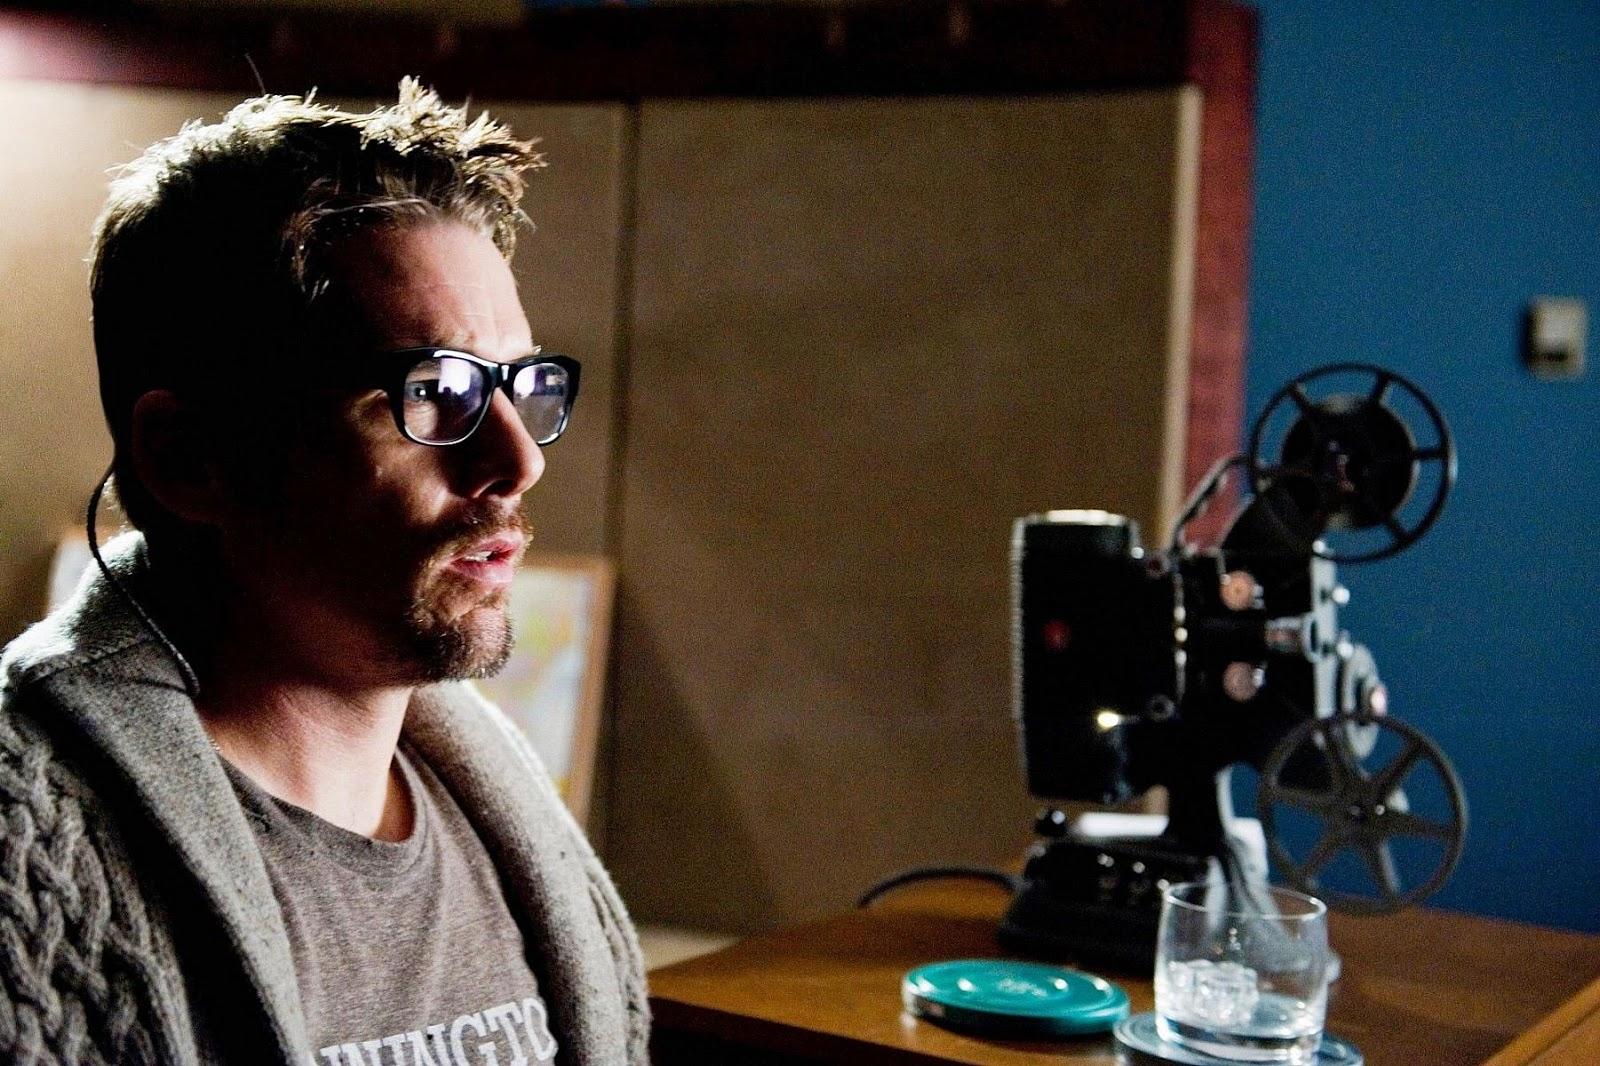 Ethan Hawke as Ellison Oswalt in Sinister 2012 movieloversreviews.blogspot.com